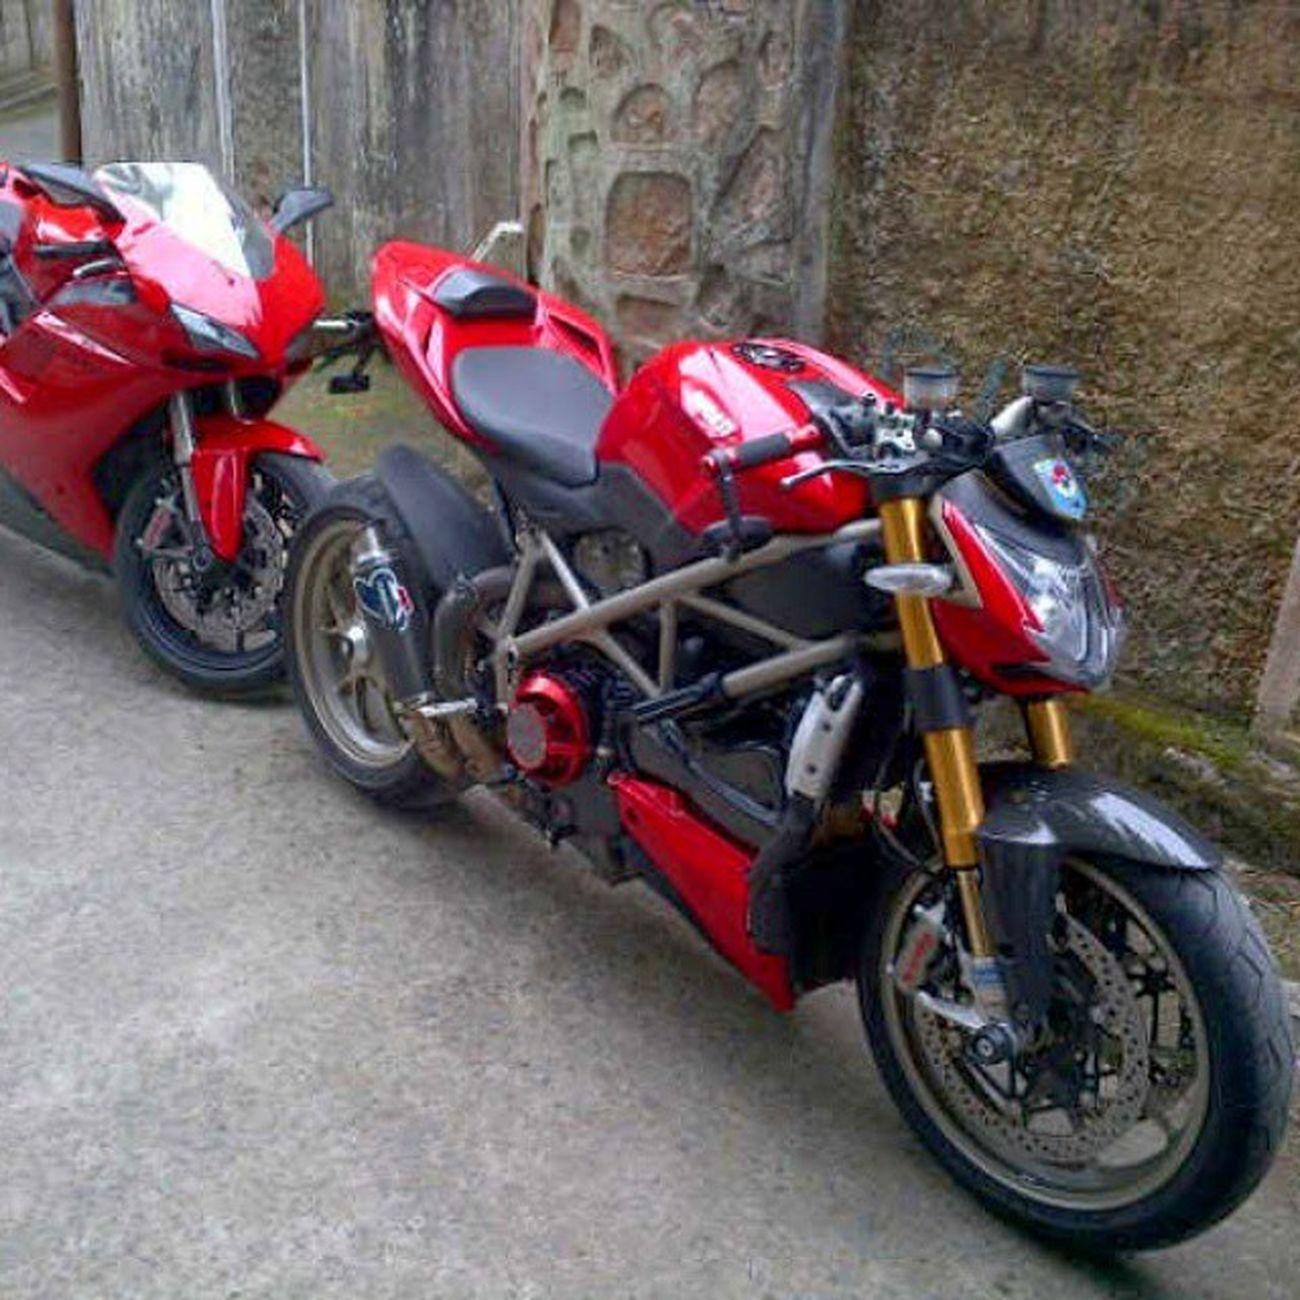 Latepost. Ducati Ducatiindonesia Ducatistreetfighter 1098 Ducati848 Ducatisofinstagram Italia Brembo  Pirelli Ohlins Termignoni Rizoma Dryclutch Red Cucoeym